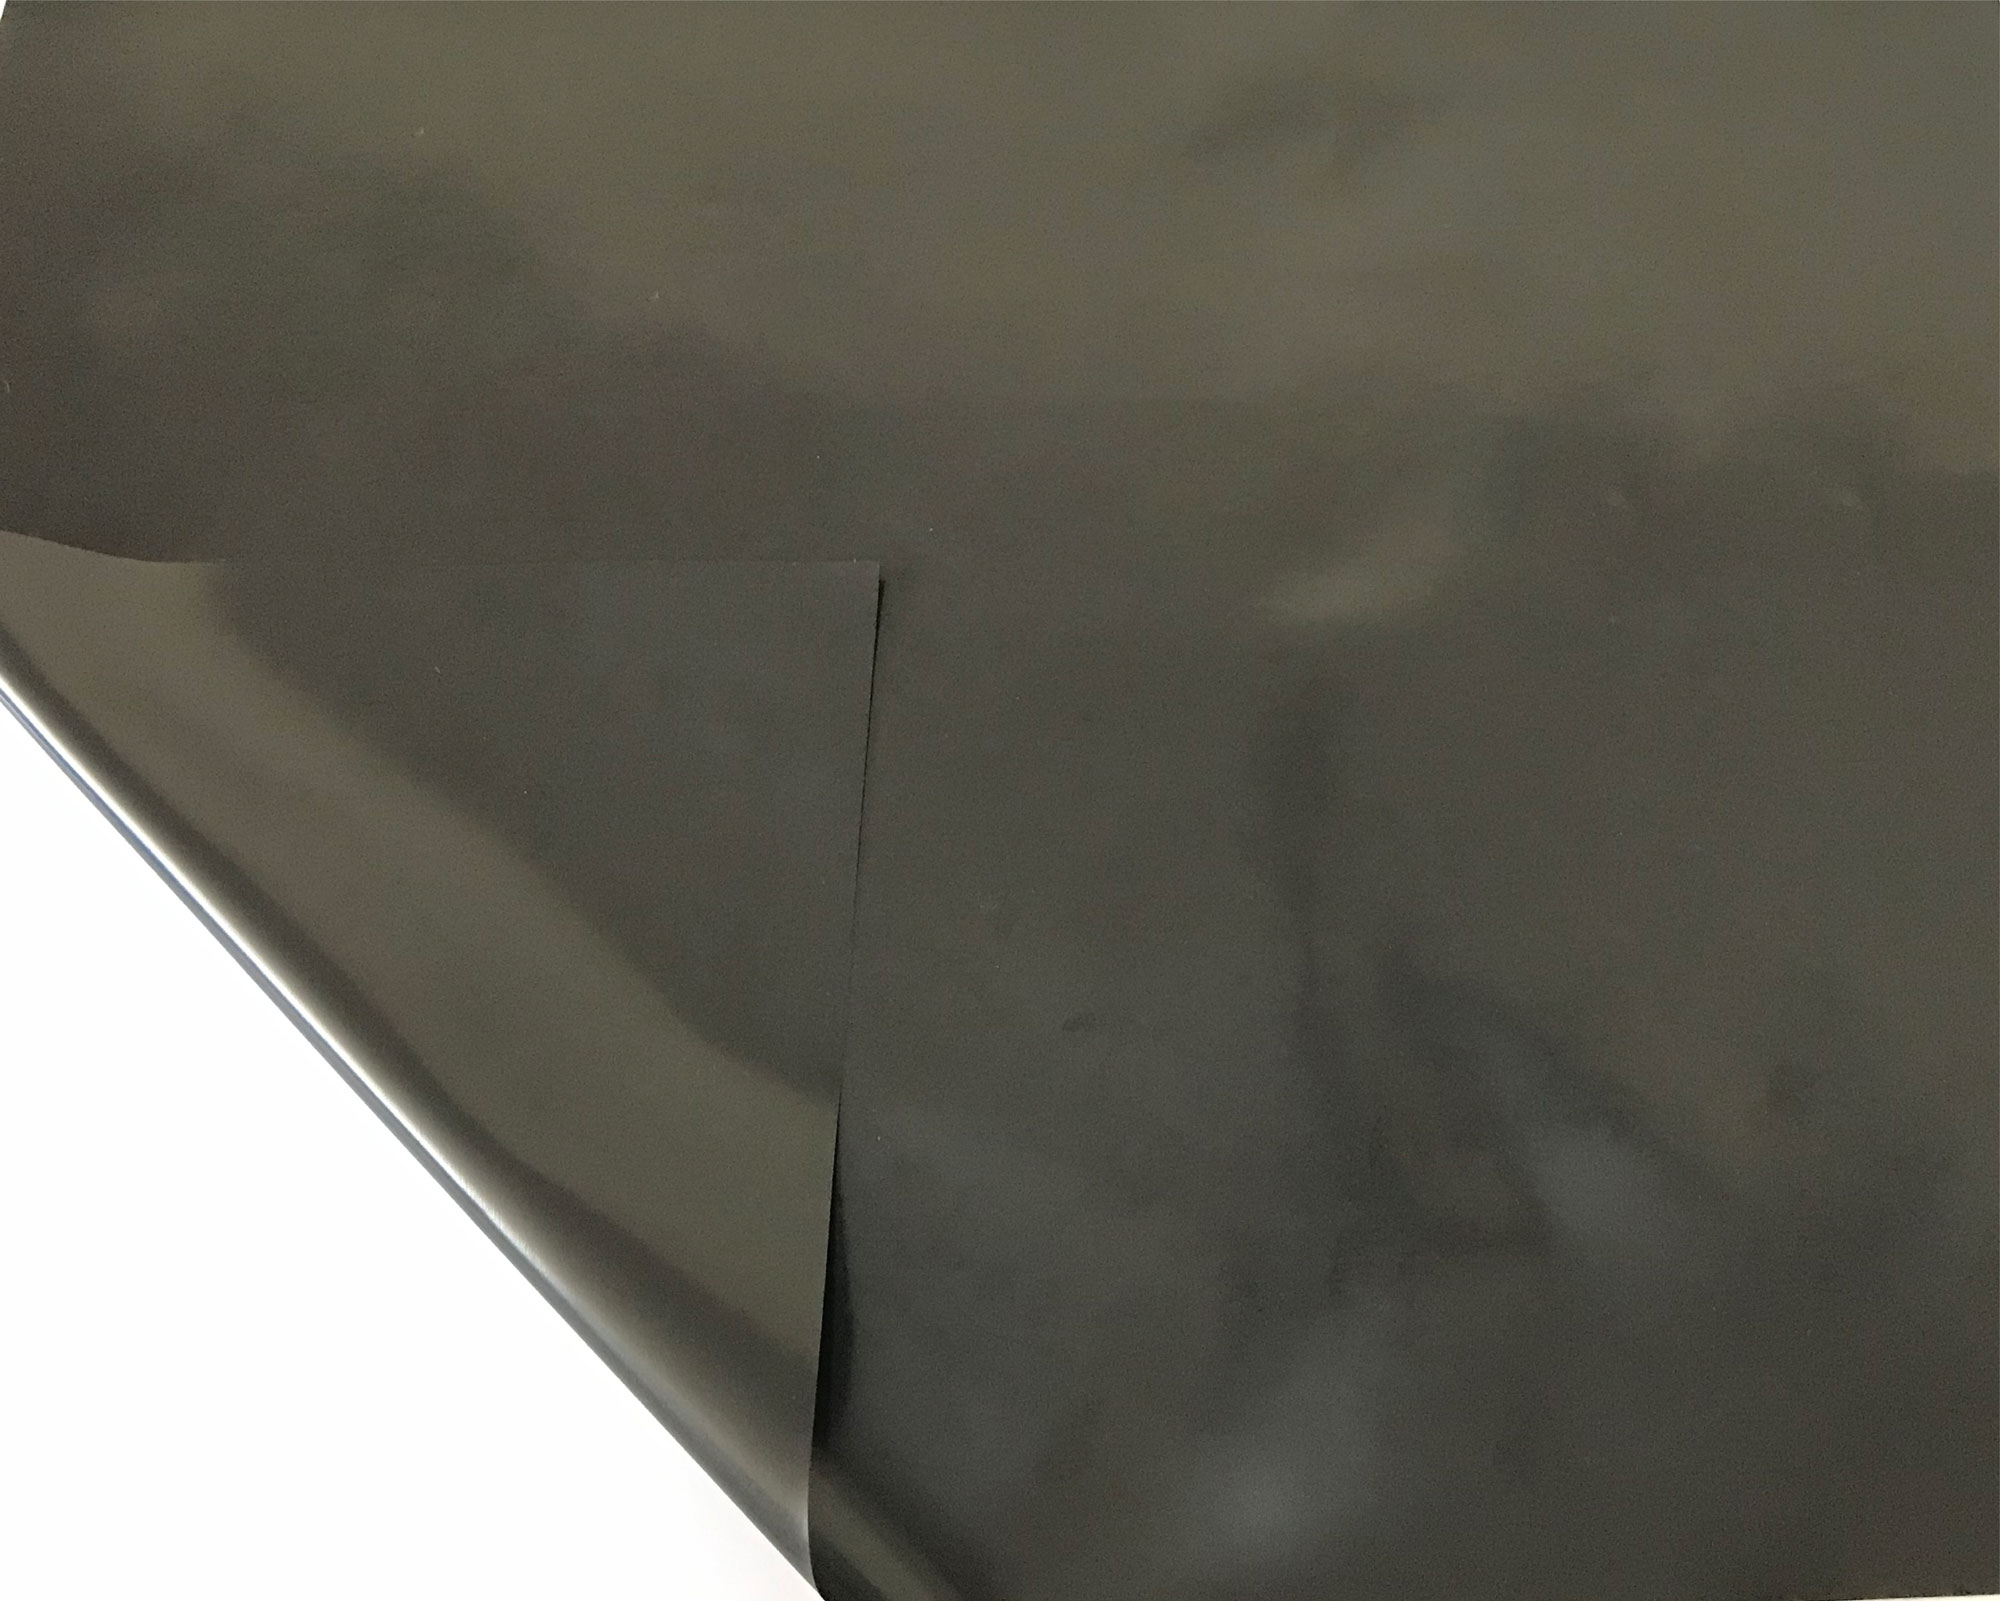 Lona Geomembrana + Manta Bidim 300 Micras - 6x5